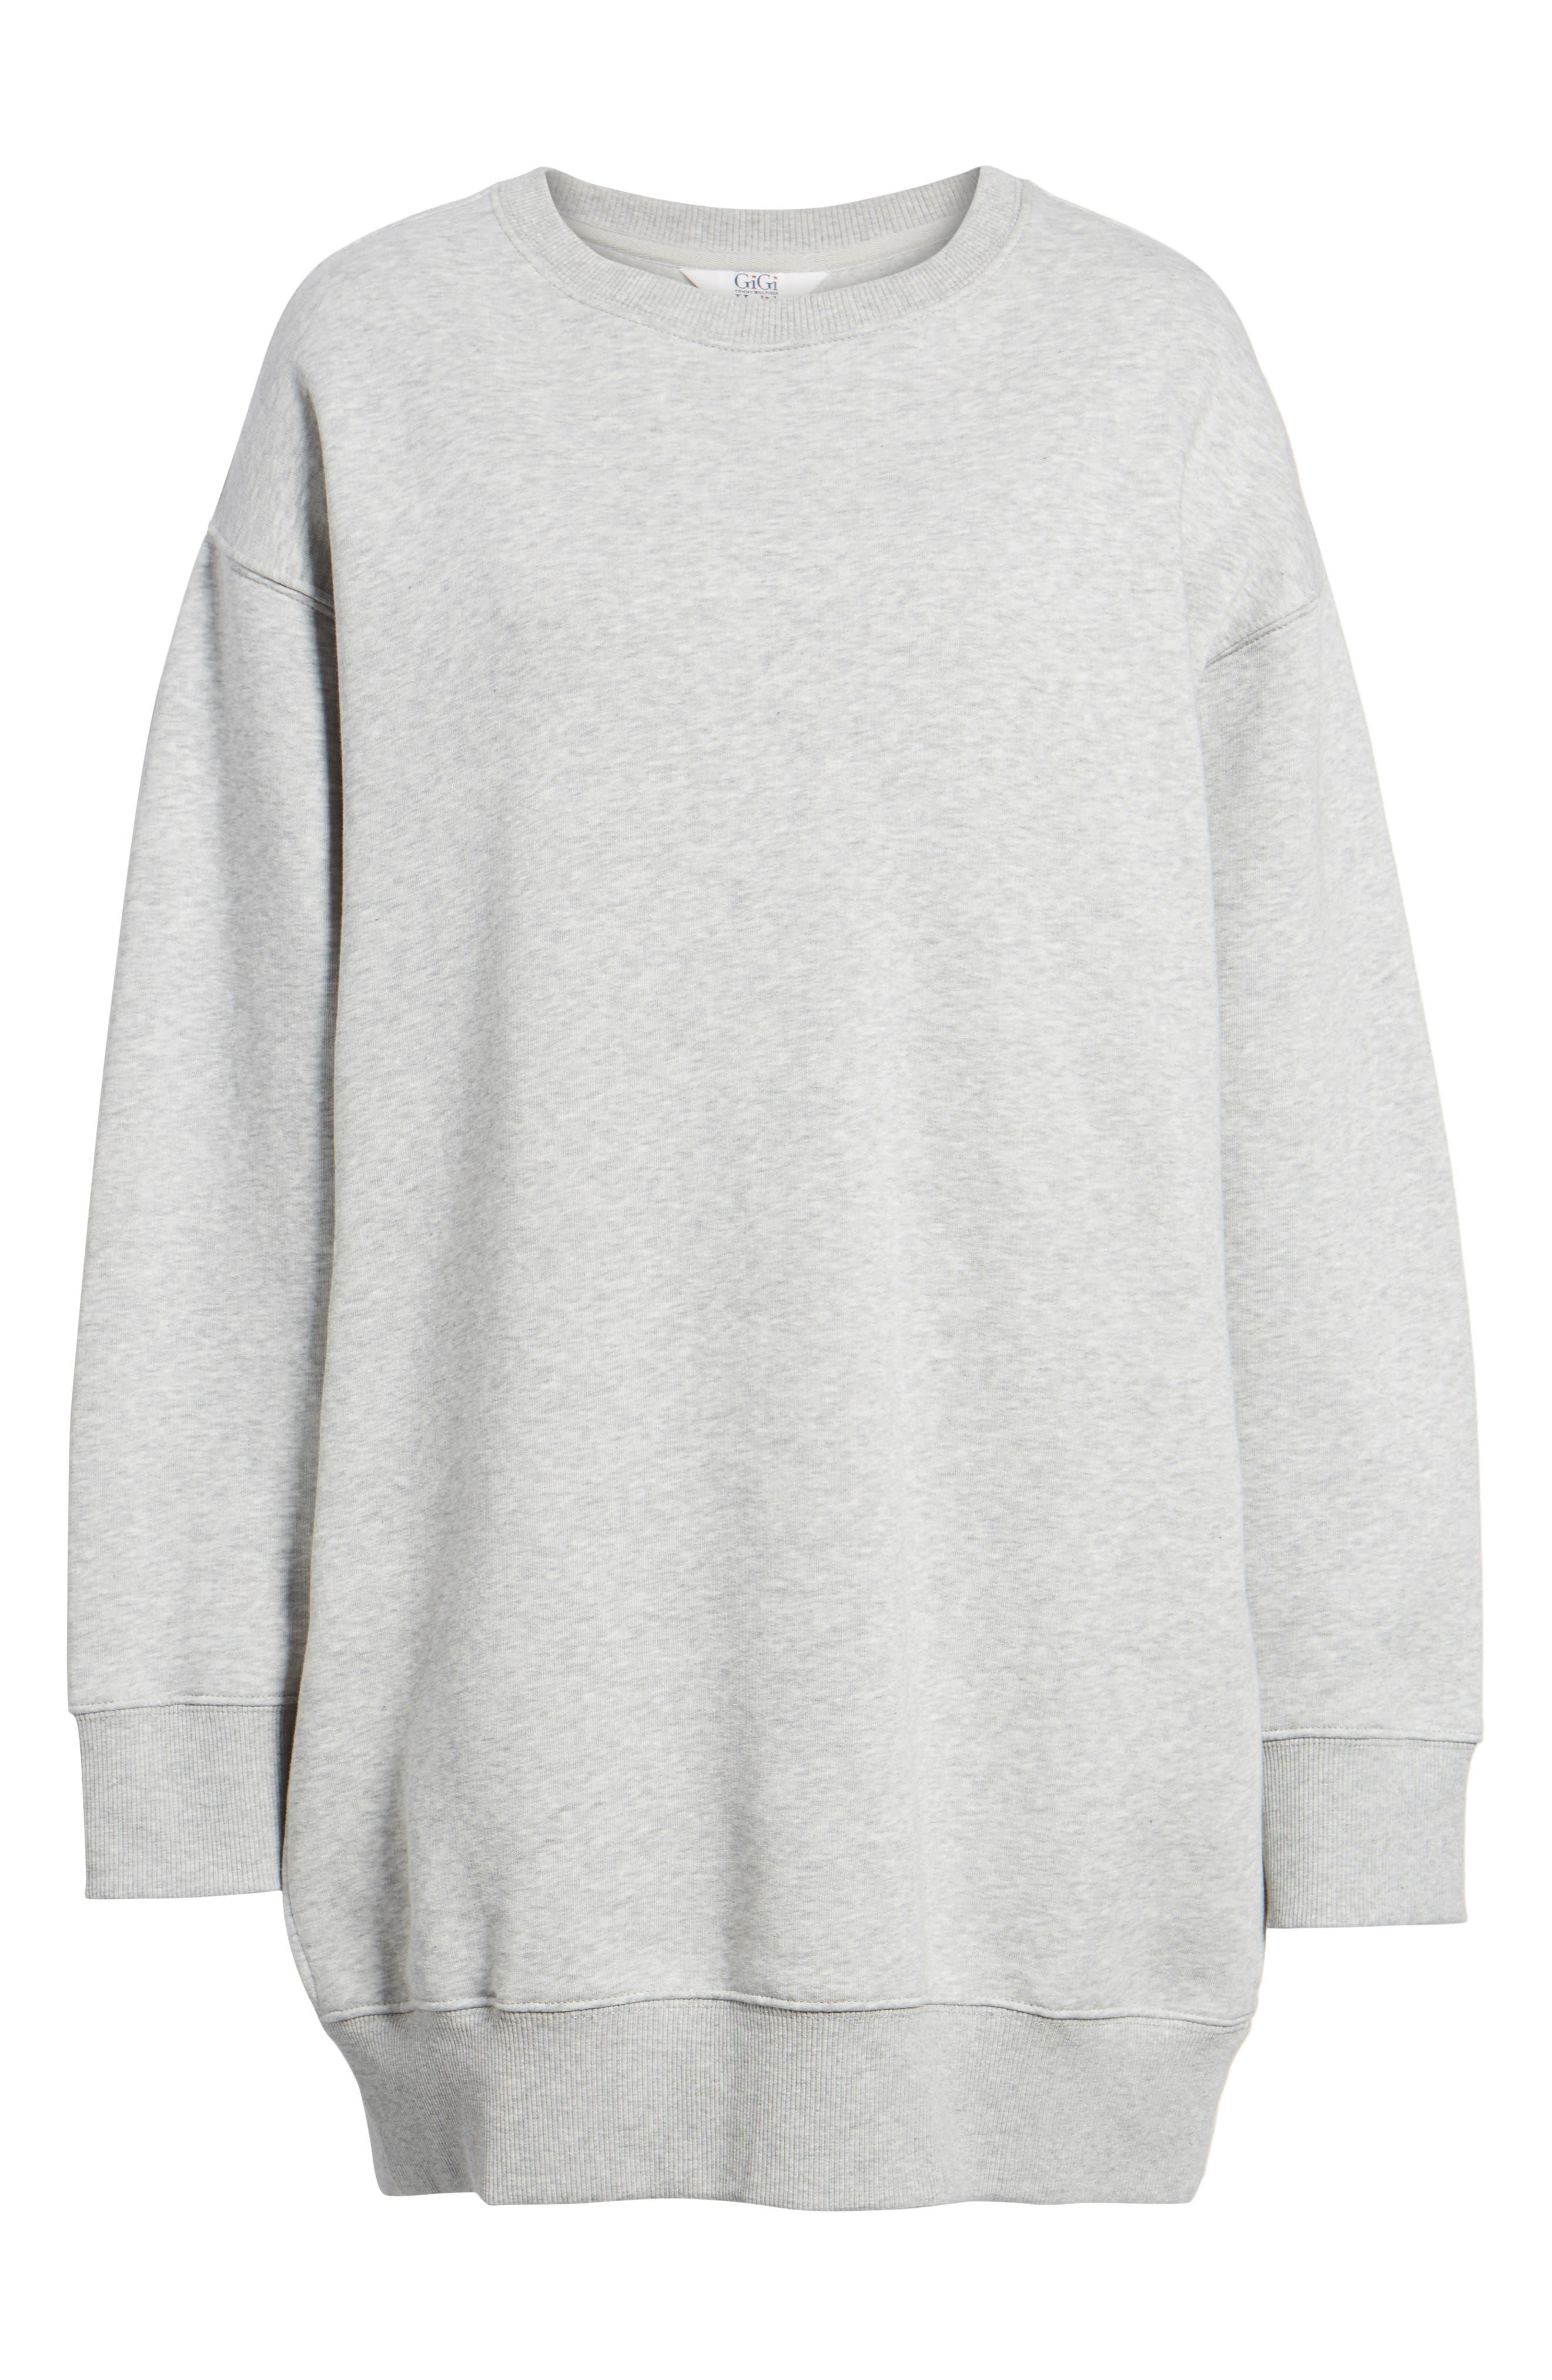 x Gigi Hadid Sweatshirt Dress,                             Alternate thumbnail 6, color,                             020